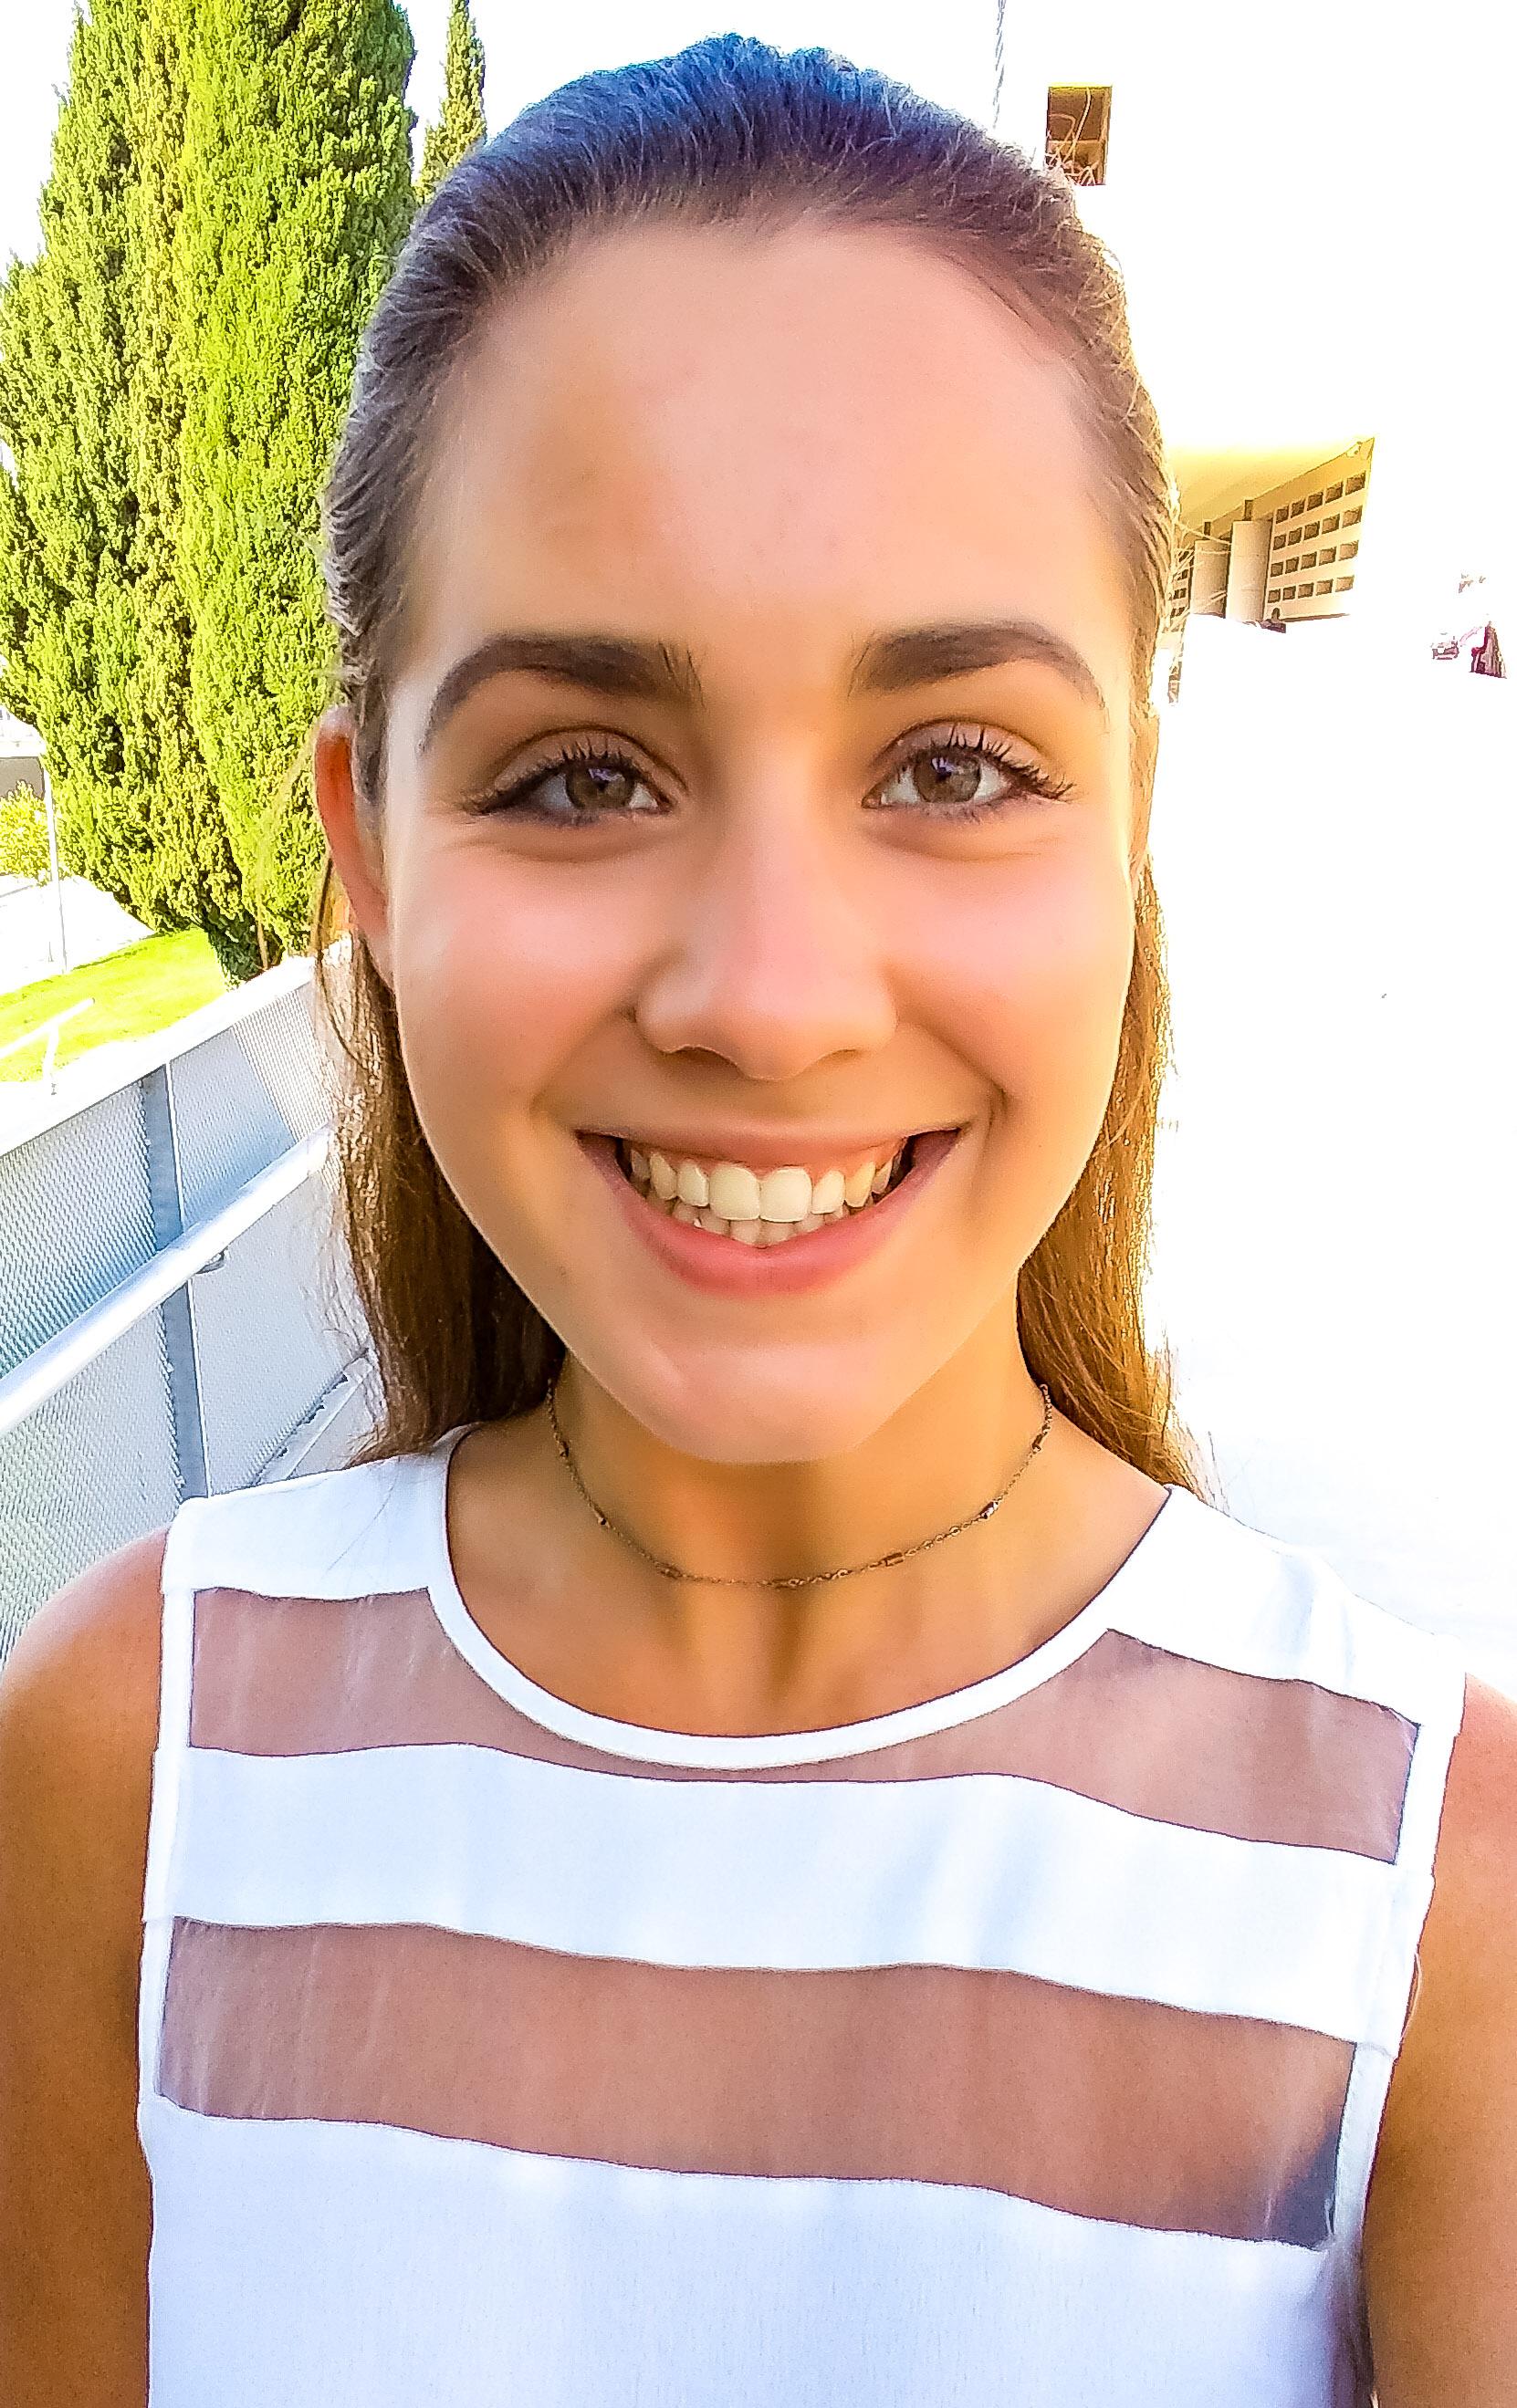 selfie of girl smiling in the sun